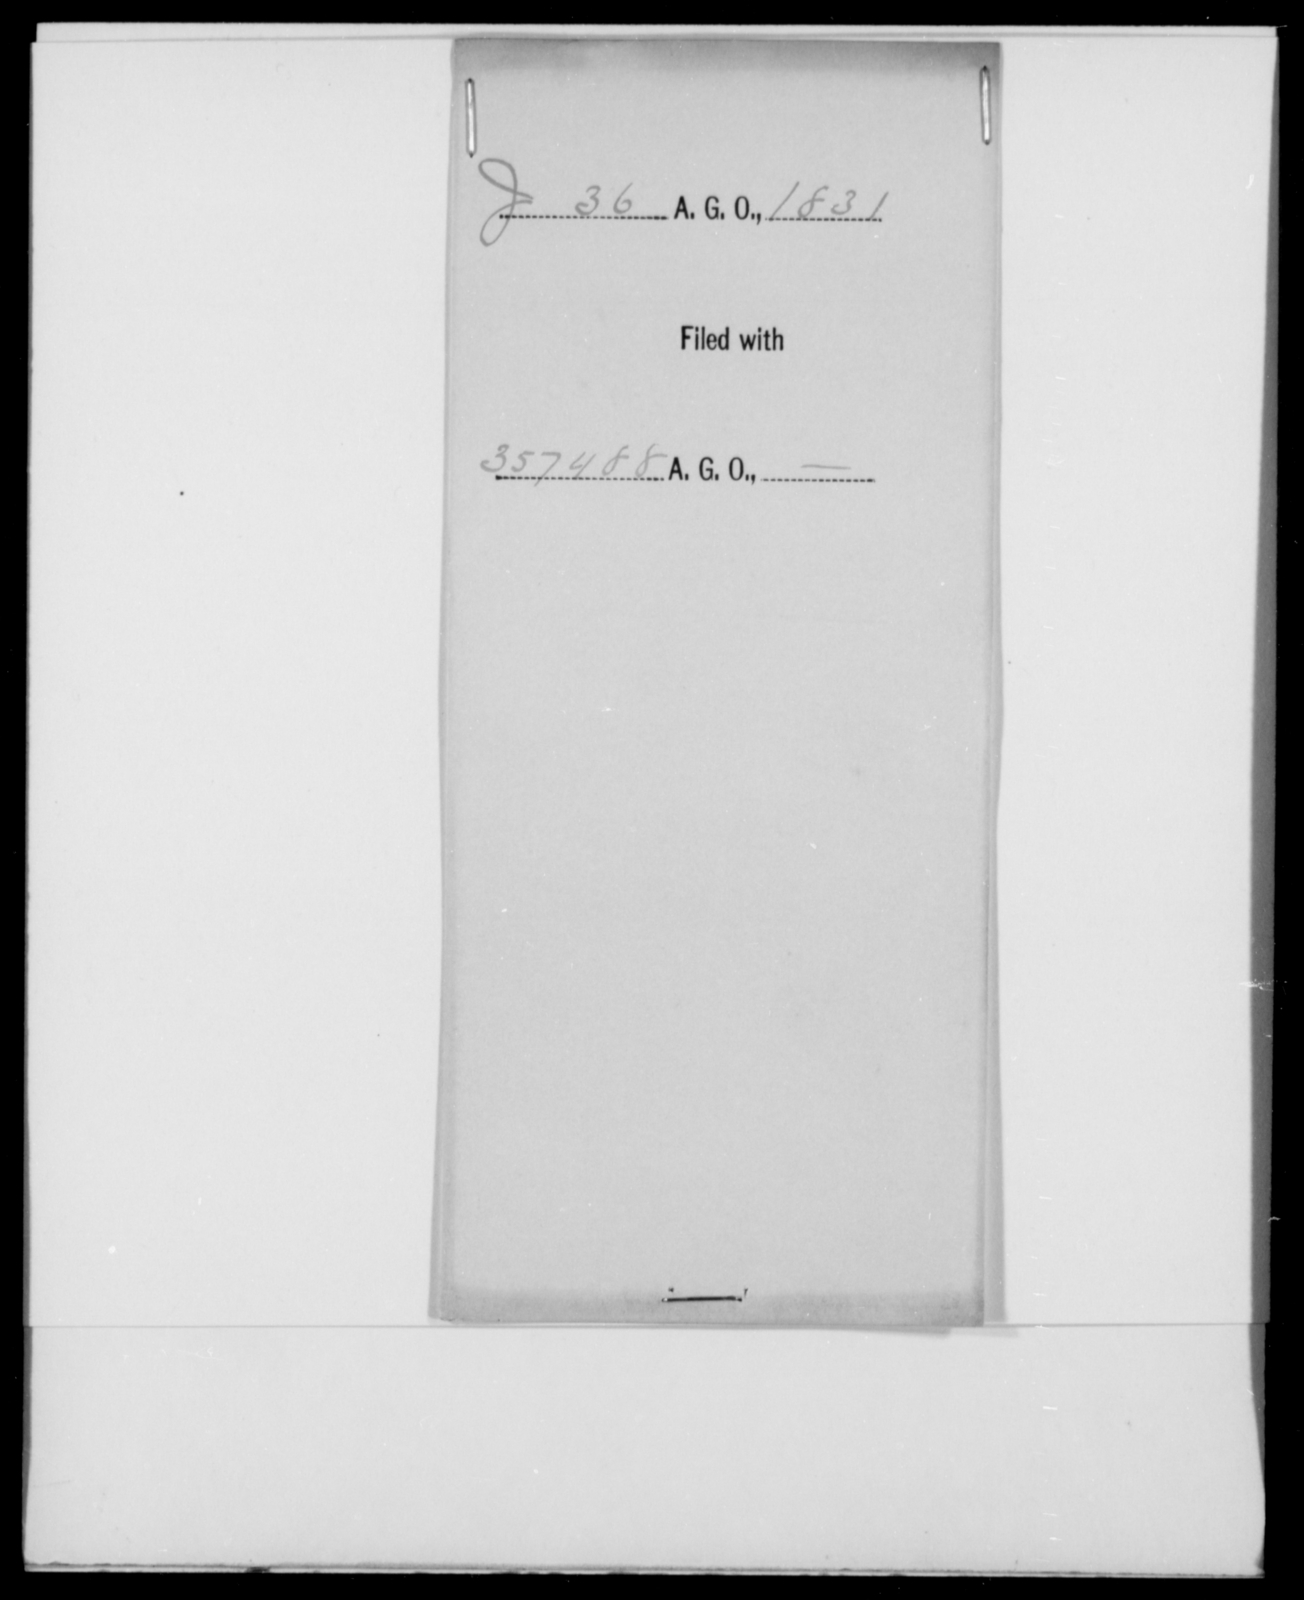 [Blank], [Blank] - State: [Blank] - Year: 1831 - File Number: J36